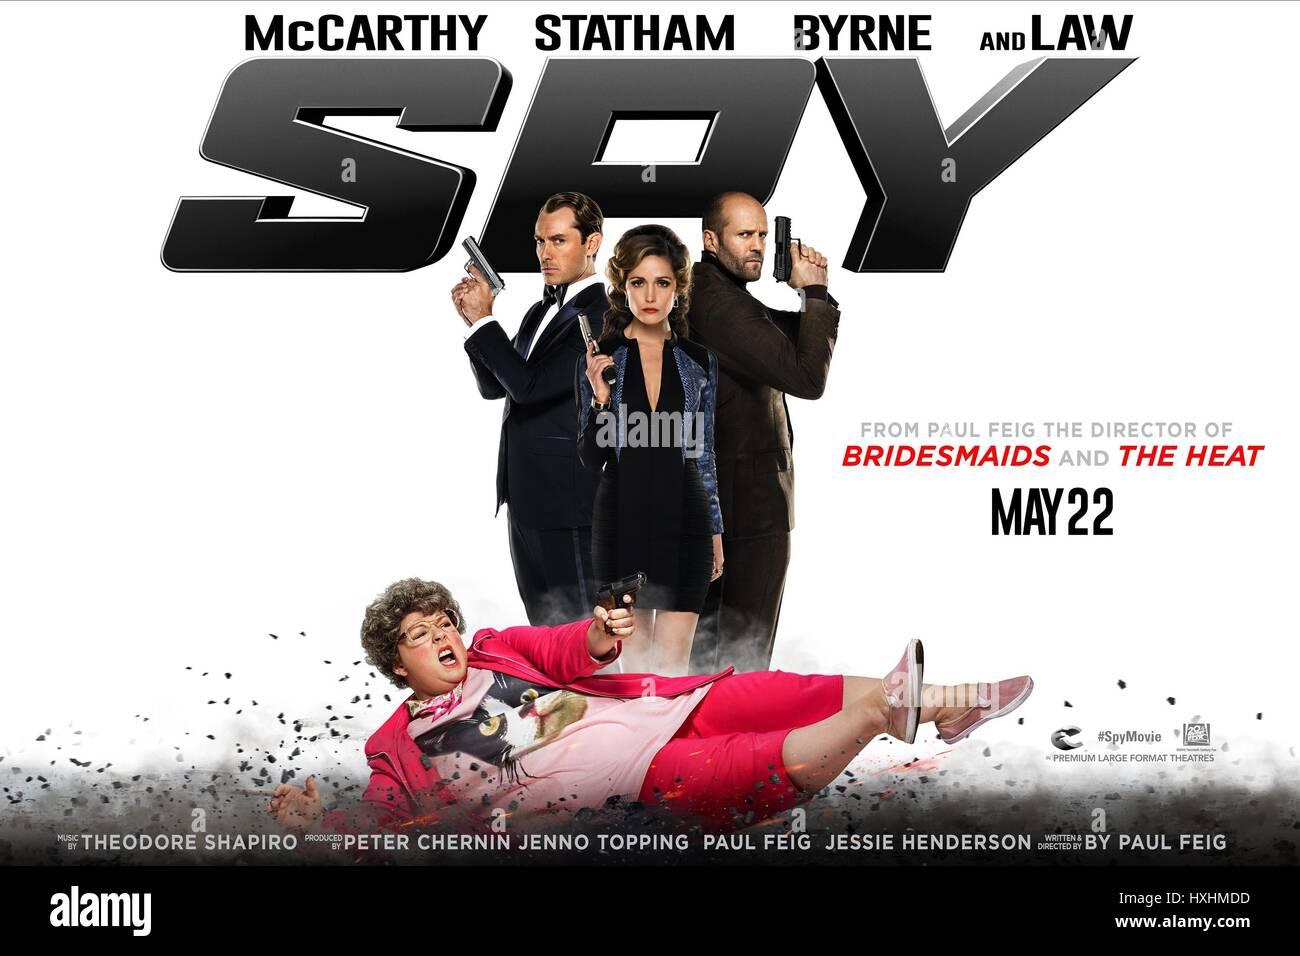 Melissa Mccarthy Jude Law Rose Byrne Jason Statham Poster Spy Stock Photo Alamy